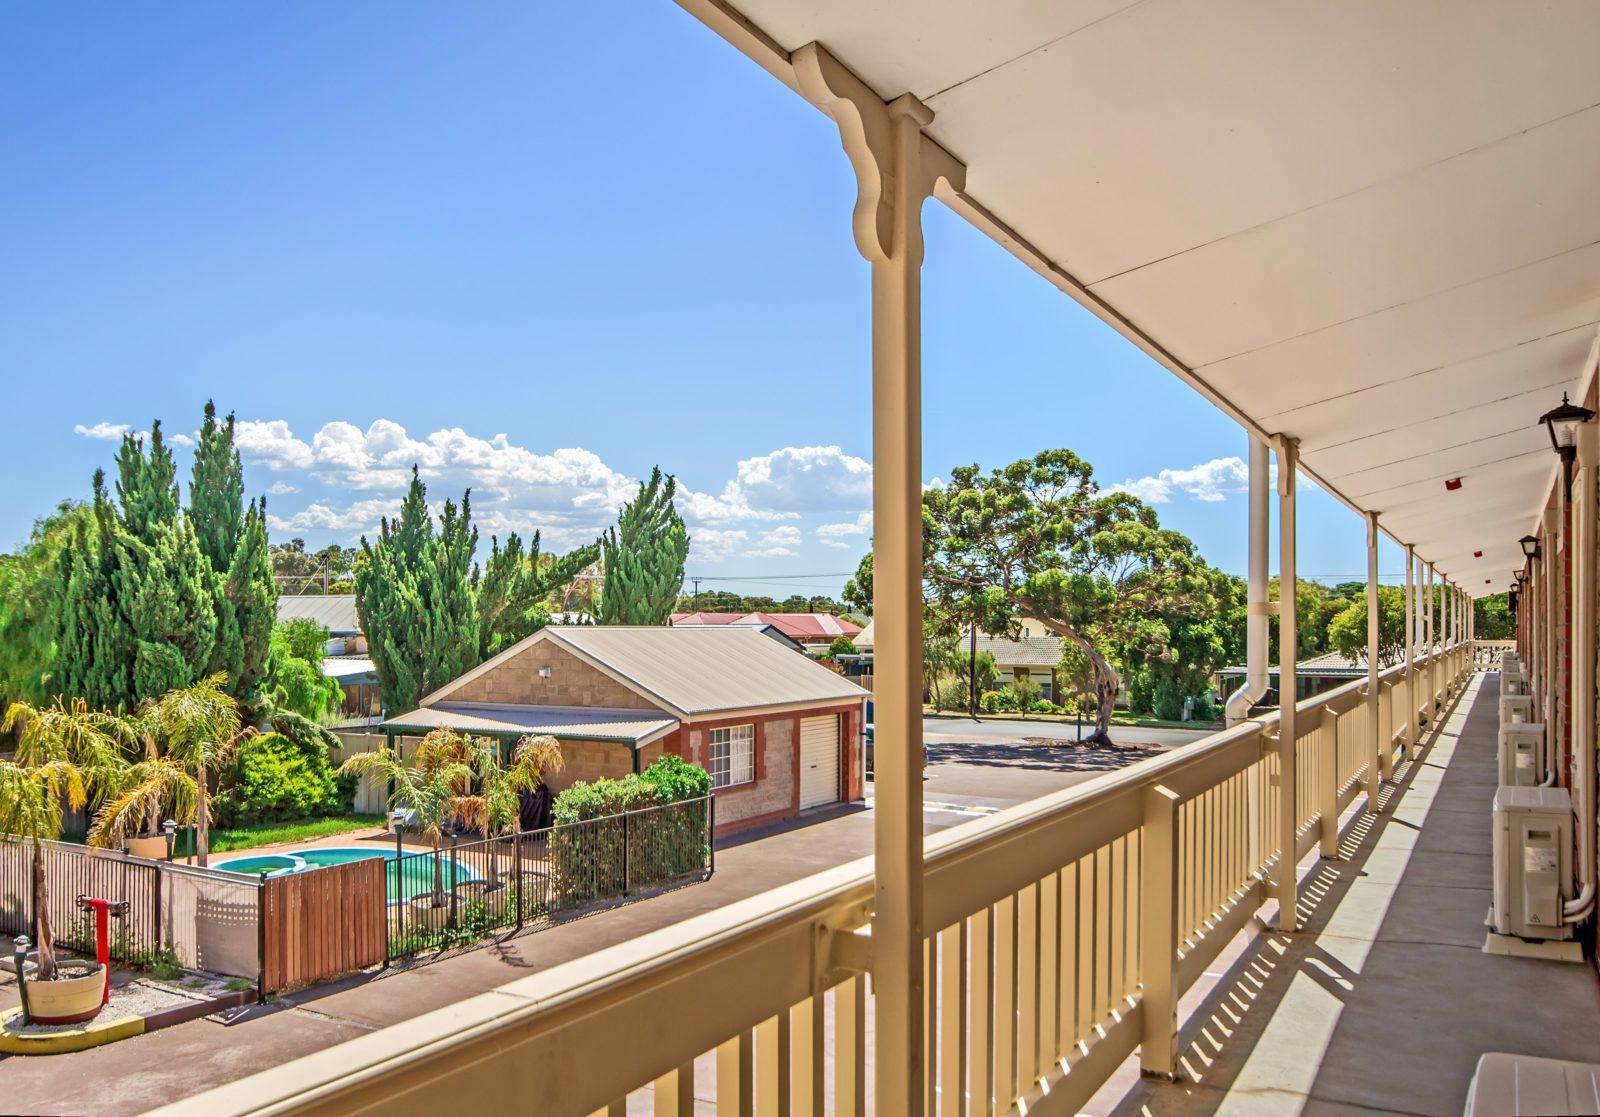 Balcony to Pool